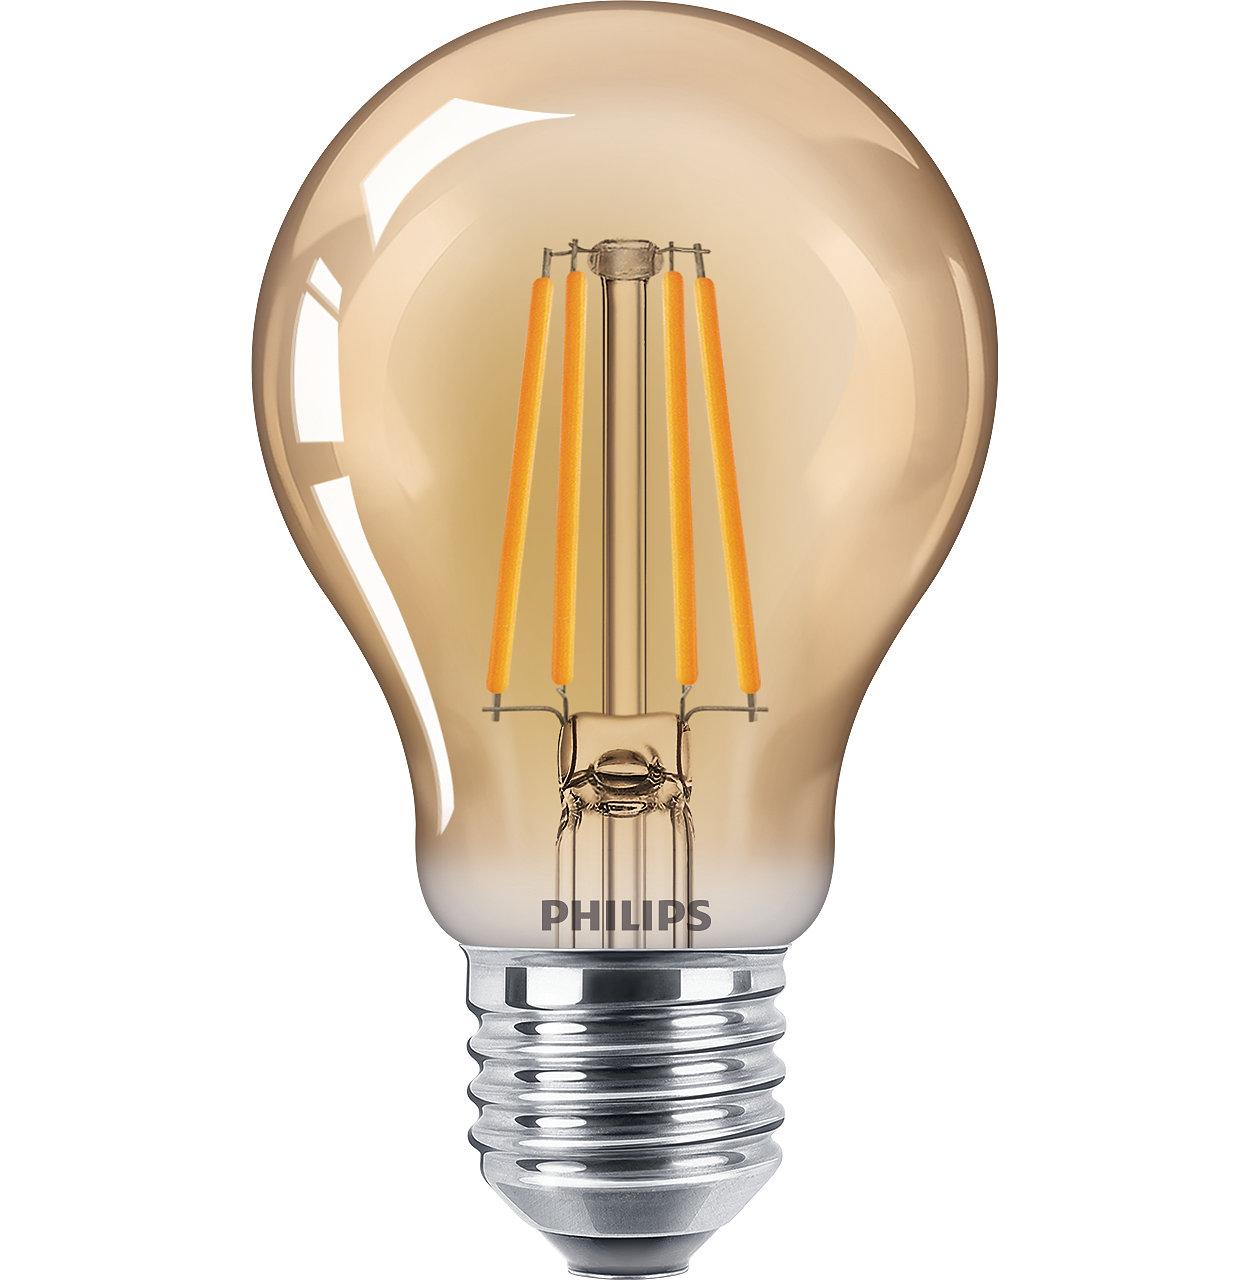 Classic LEDbulbs lamps for decorative lighting